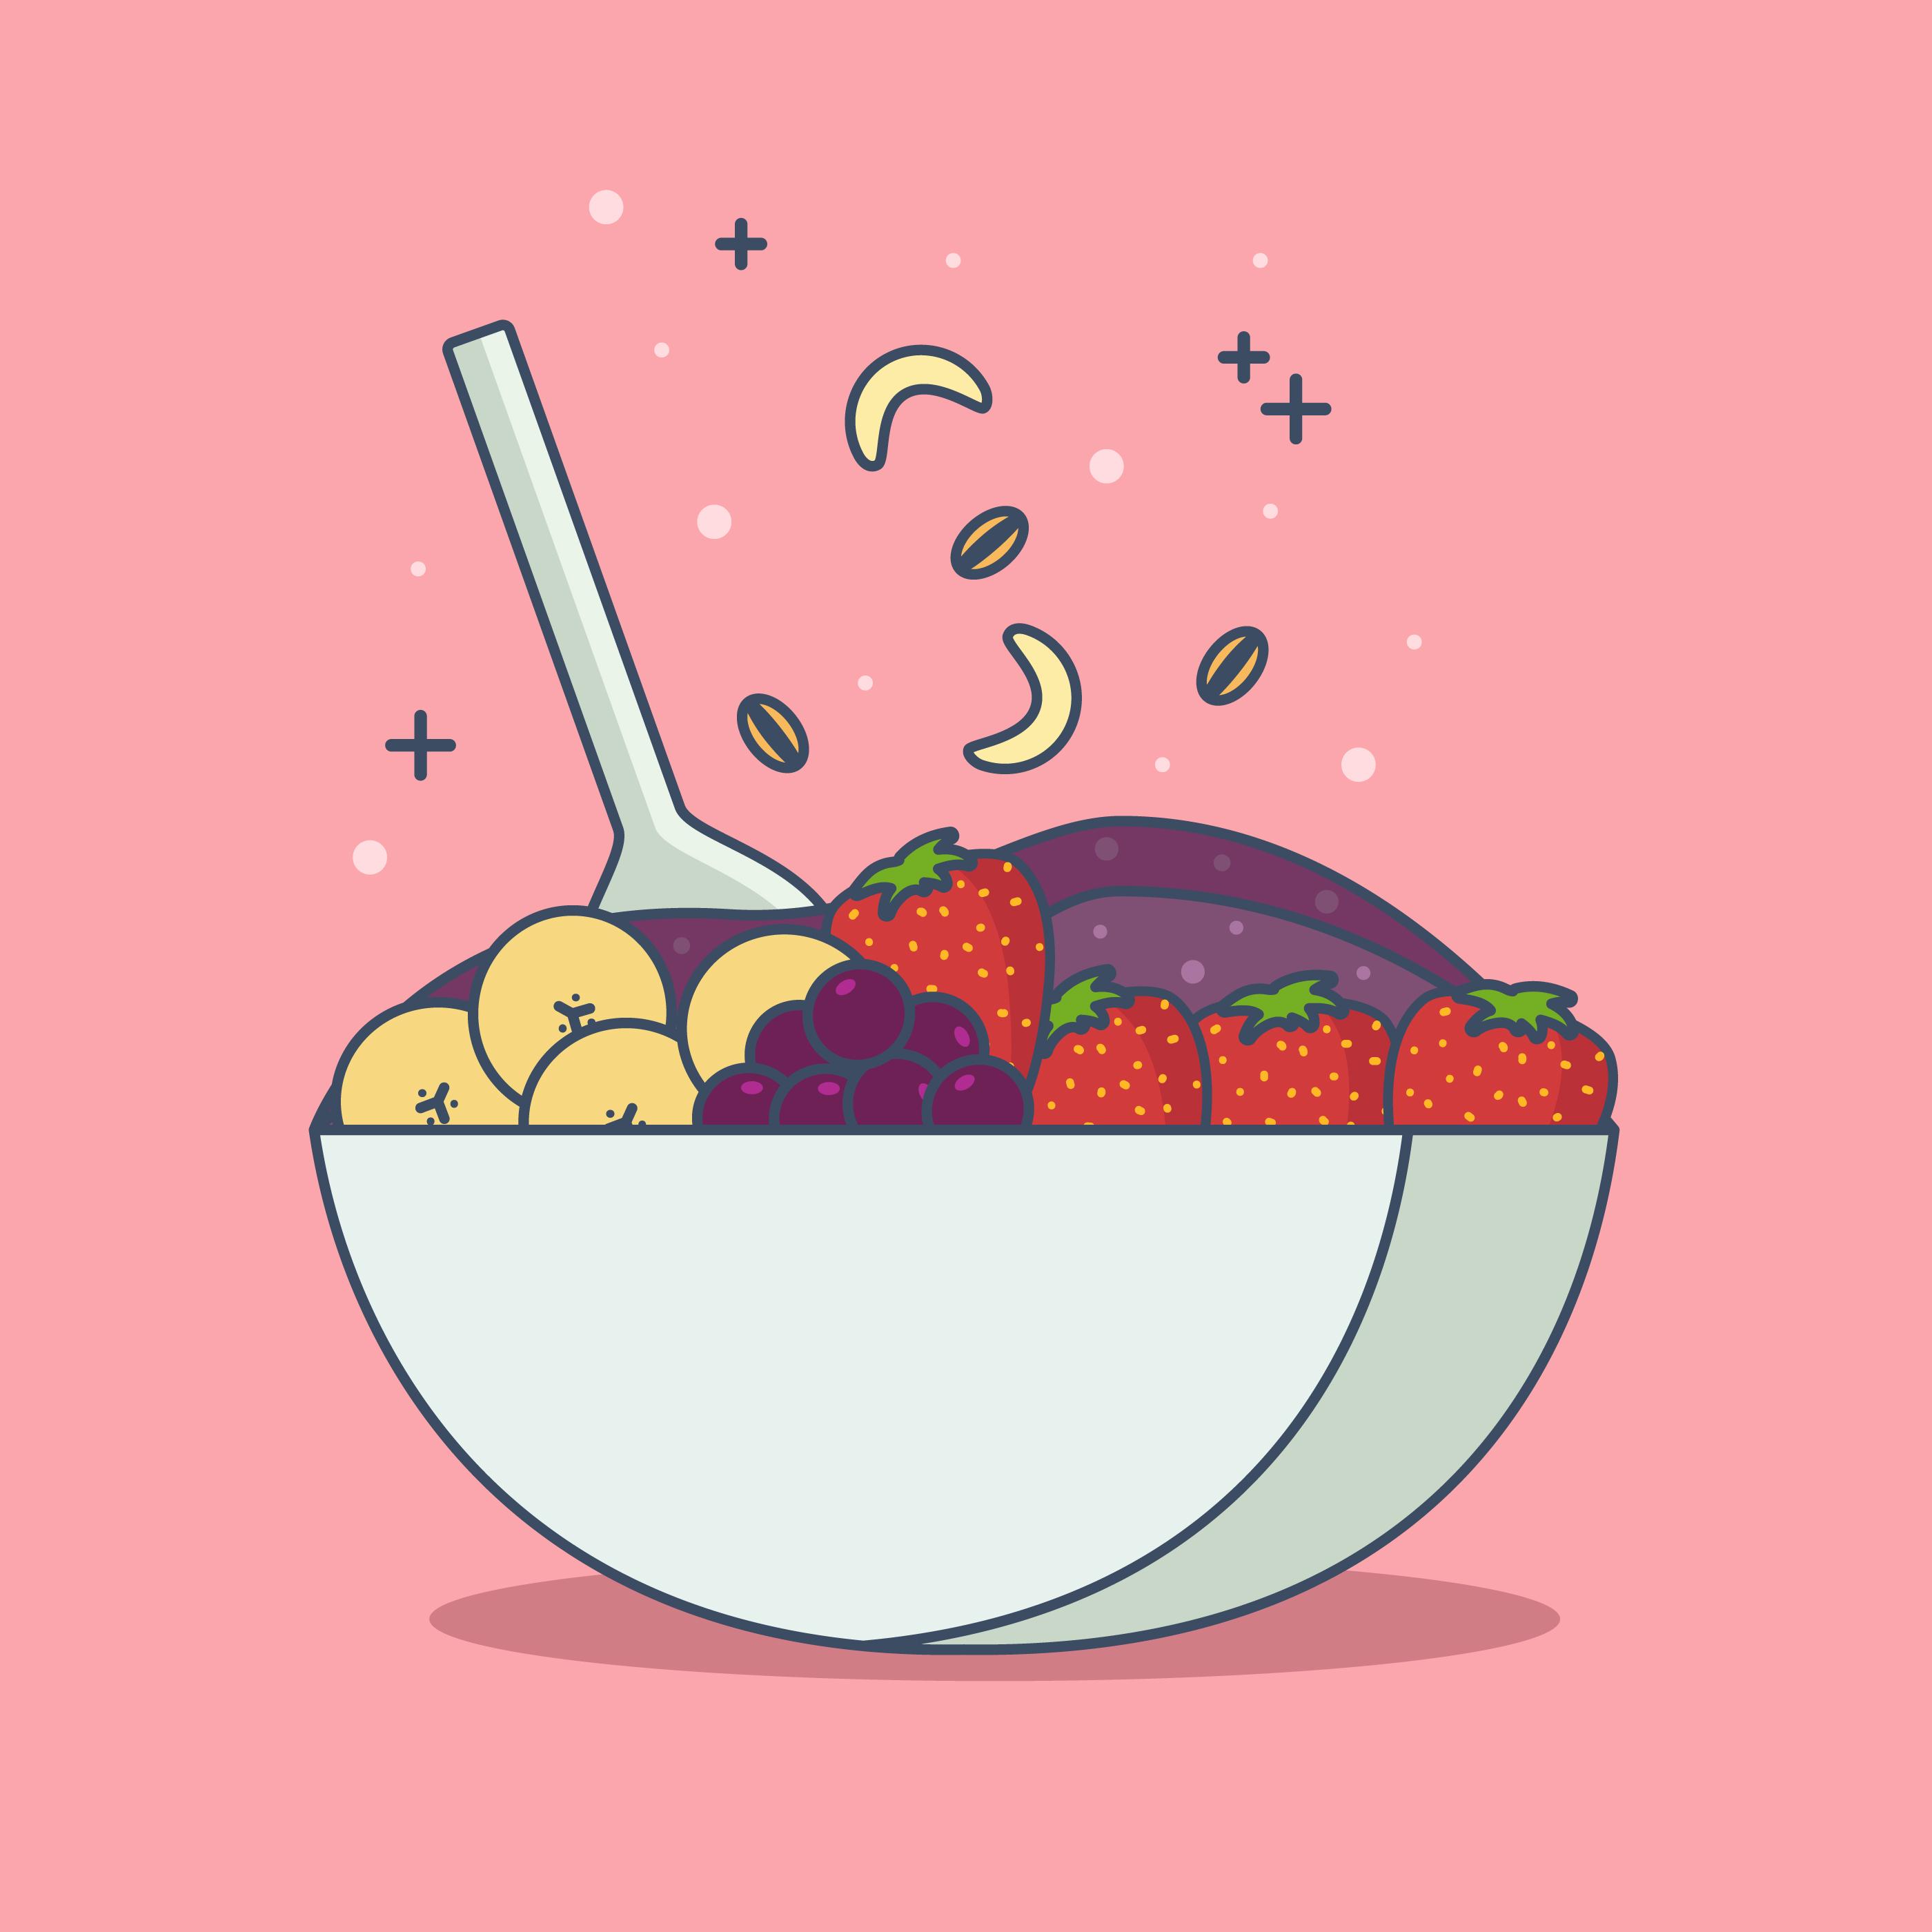 Color Acai Bowl Vector Illustration - Download Free ... (2800 x 2800 Pixel)